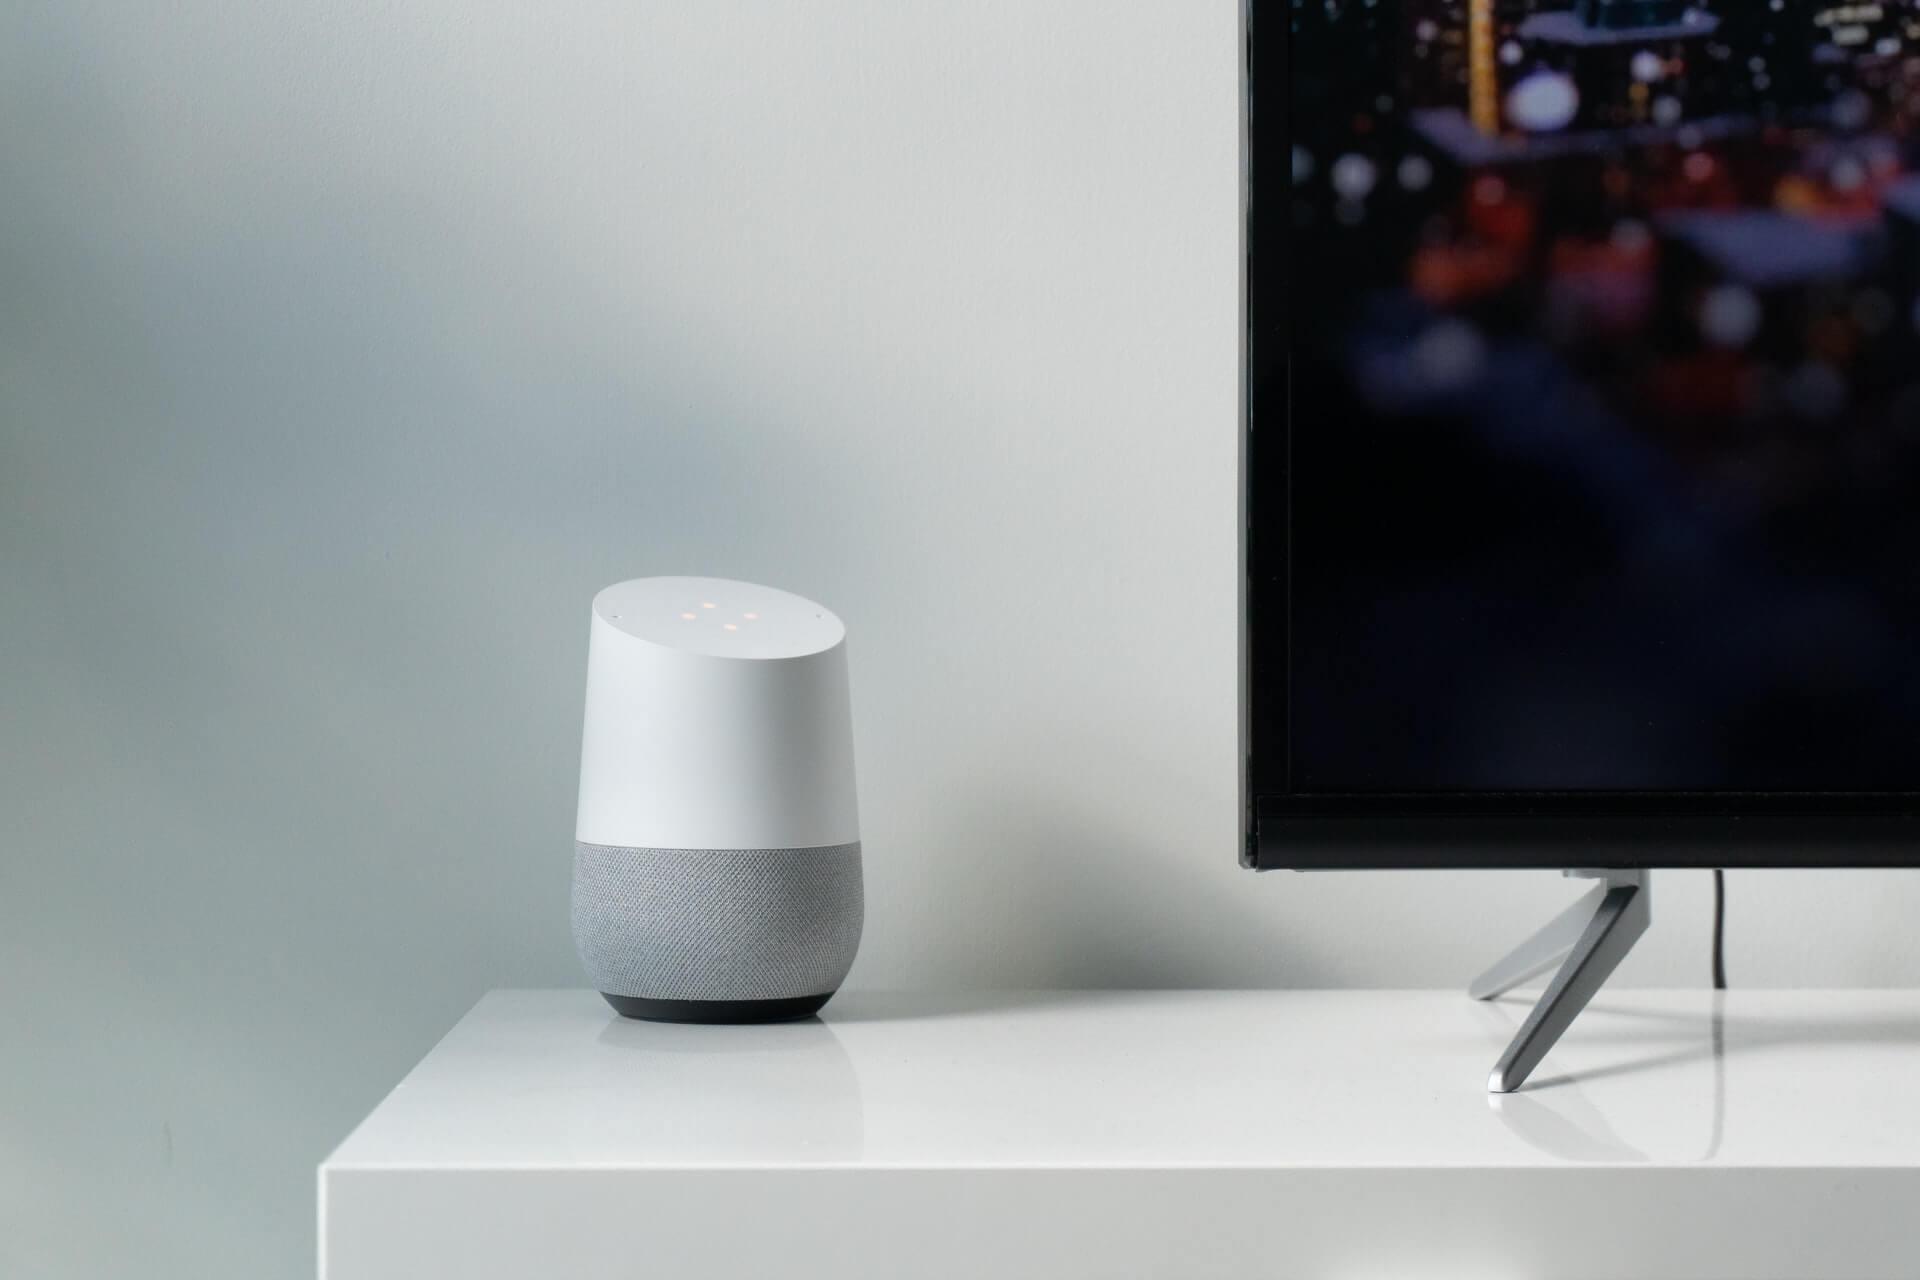 Google home privacy